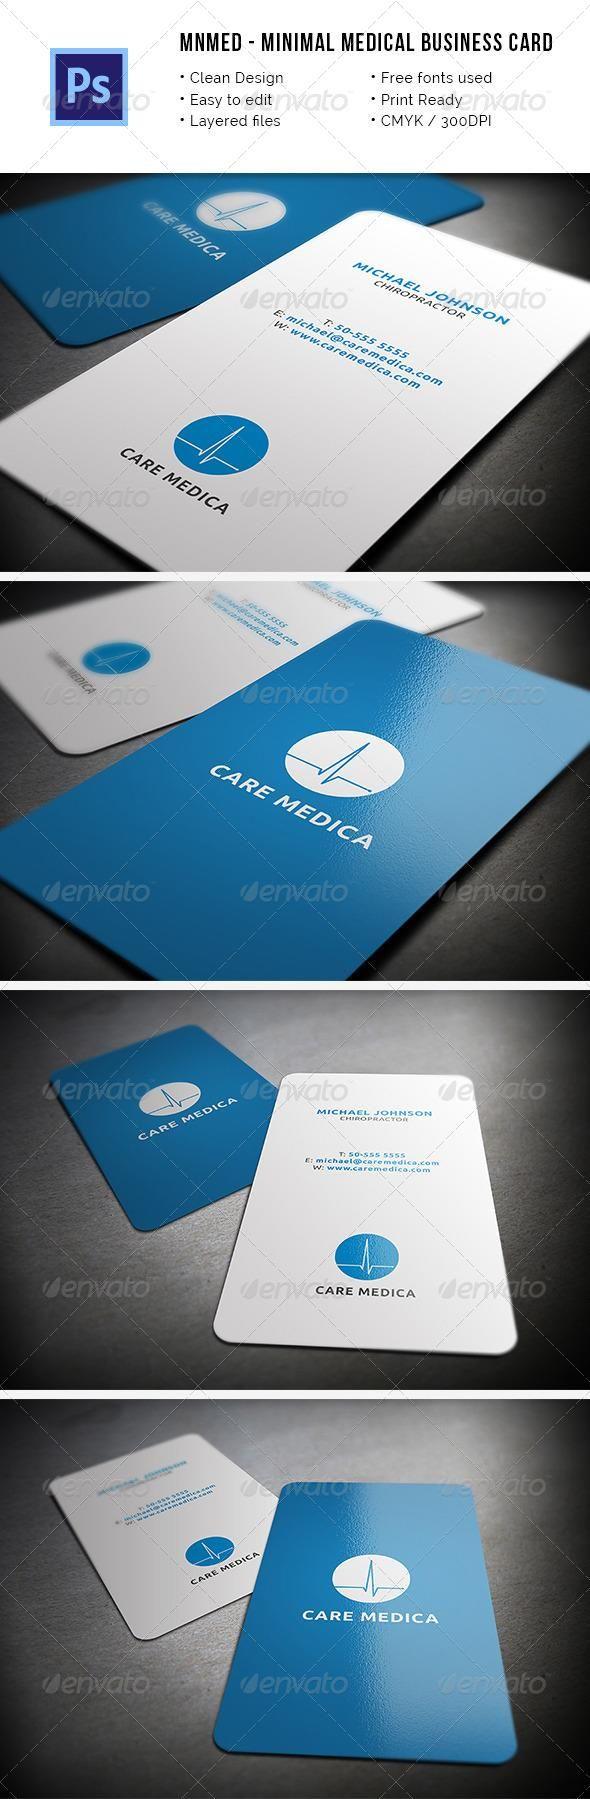 Mnmed minimal medical business card business cards minimal and mnmed minimal medical business card flashek Choice Image